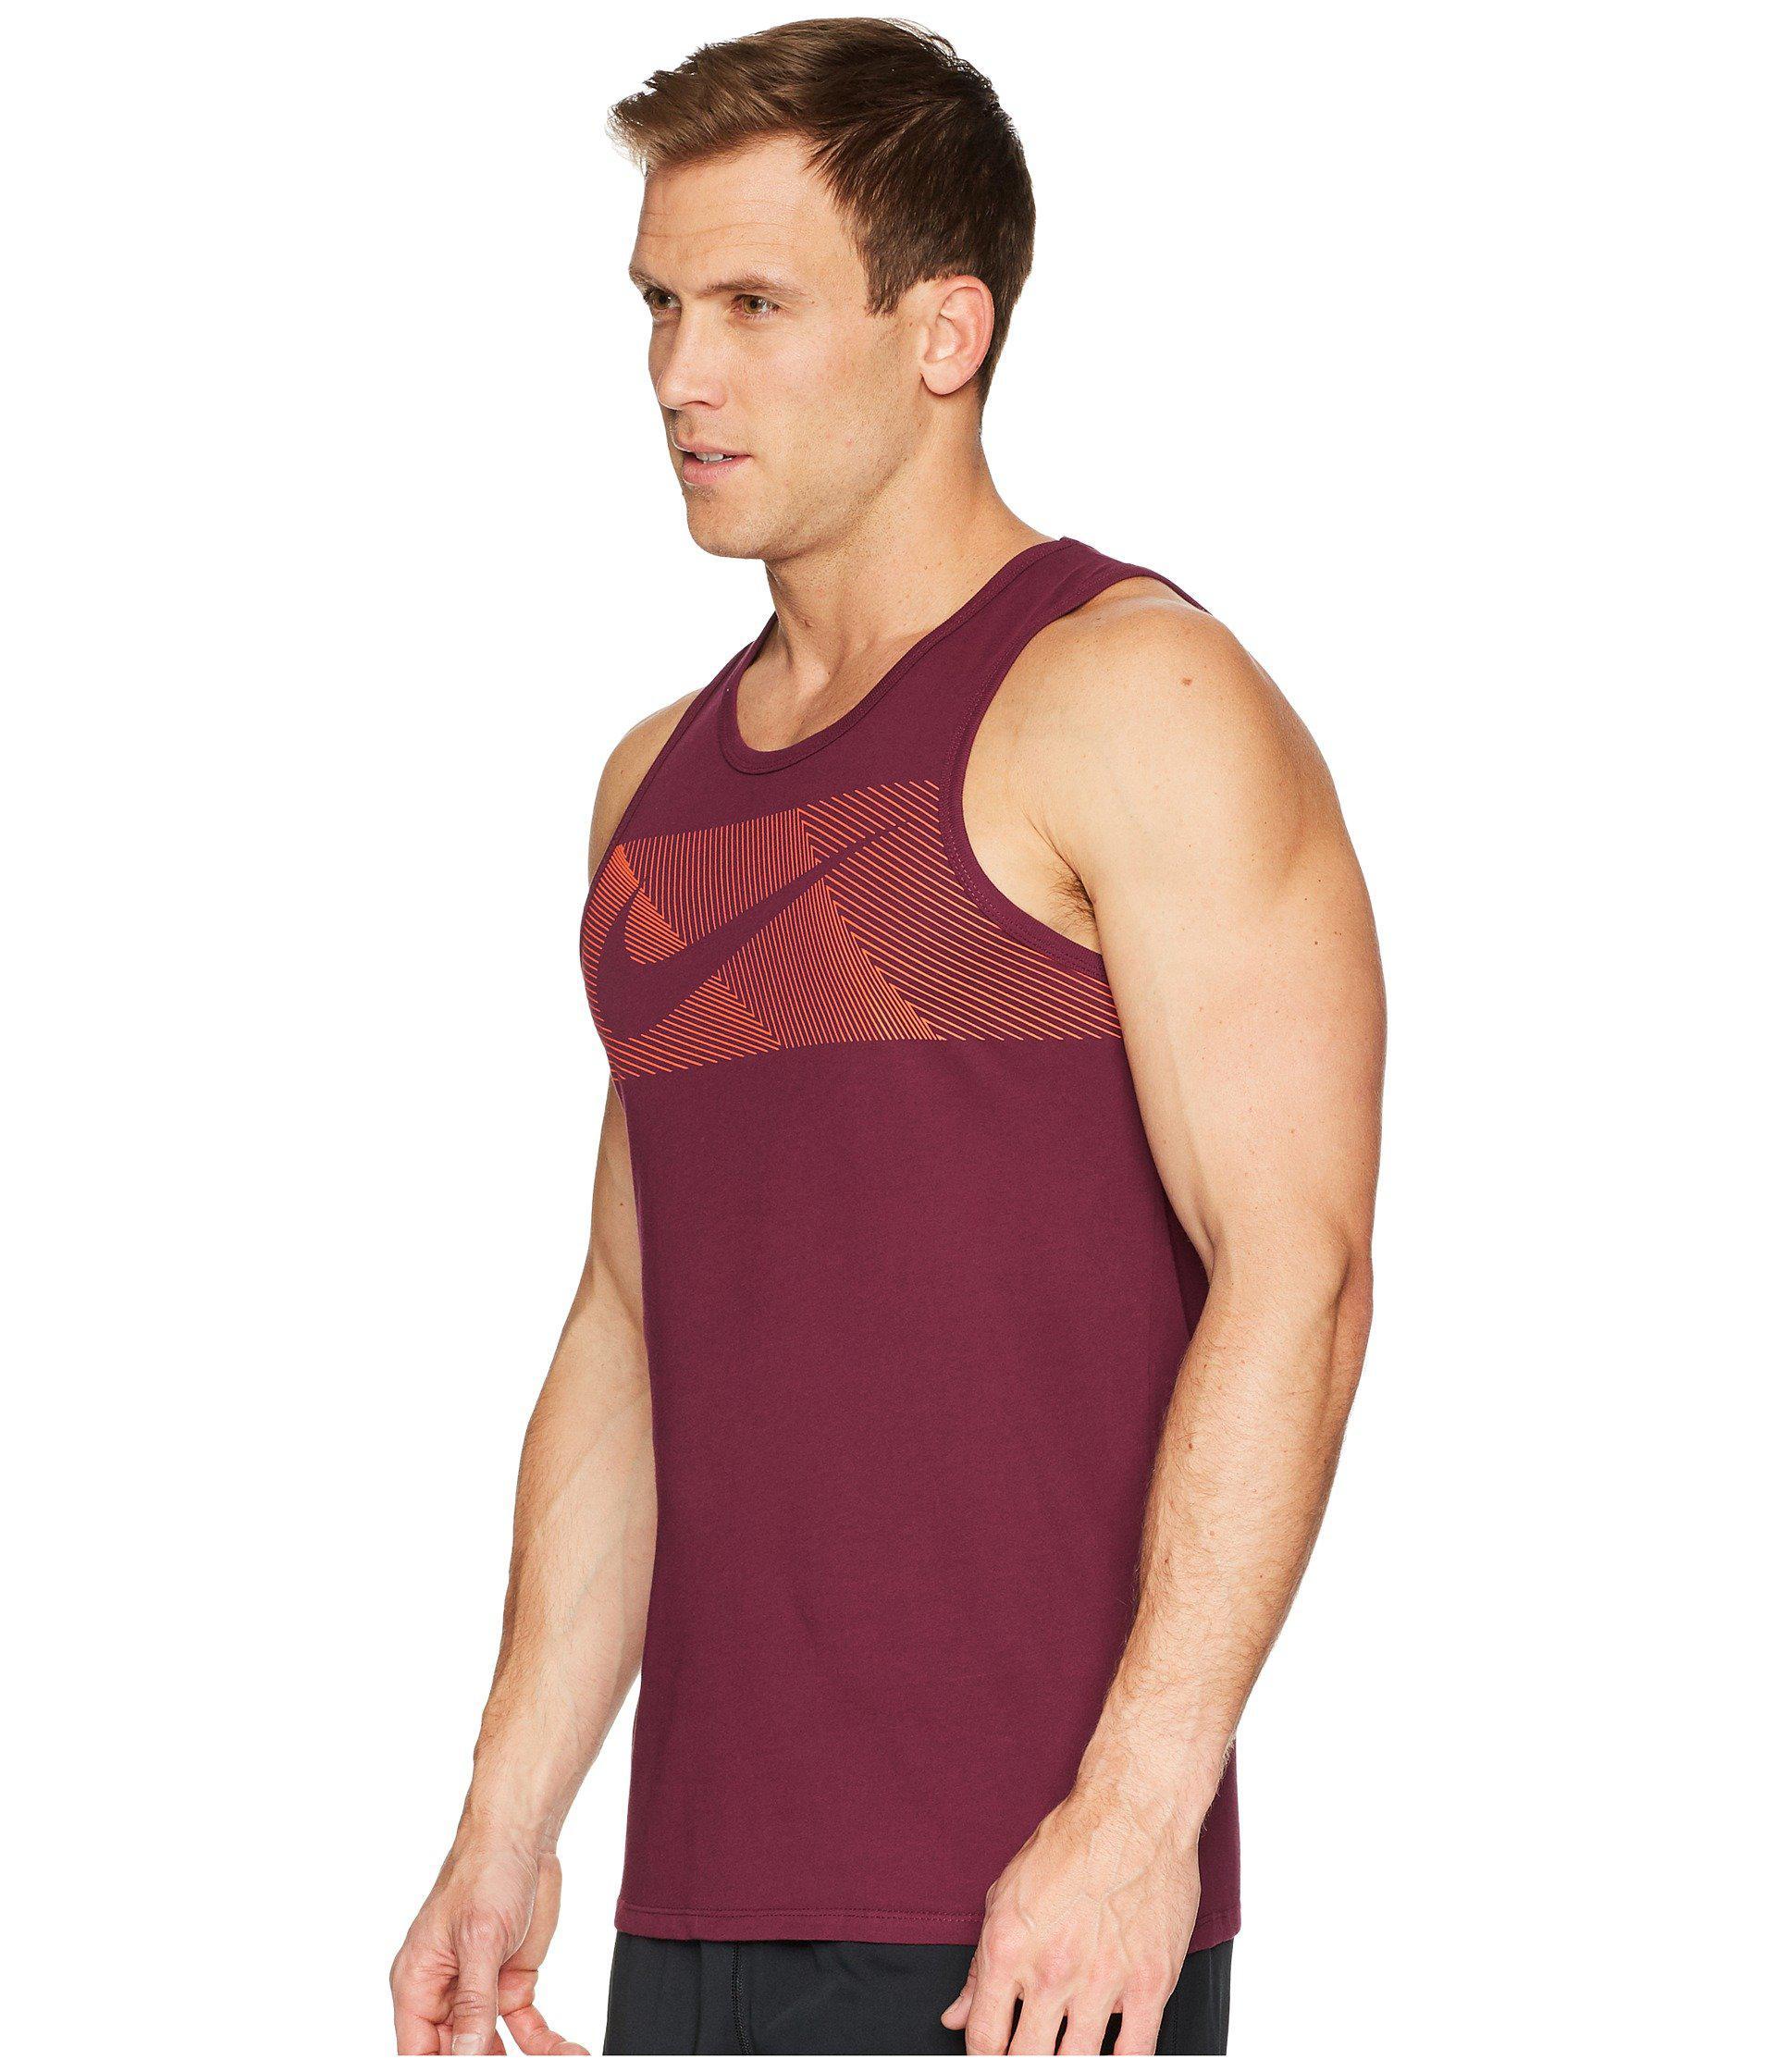 8a3f4b3a398d58 Nike Sleeveless Shirt Cotton - BCD Tofu House